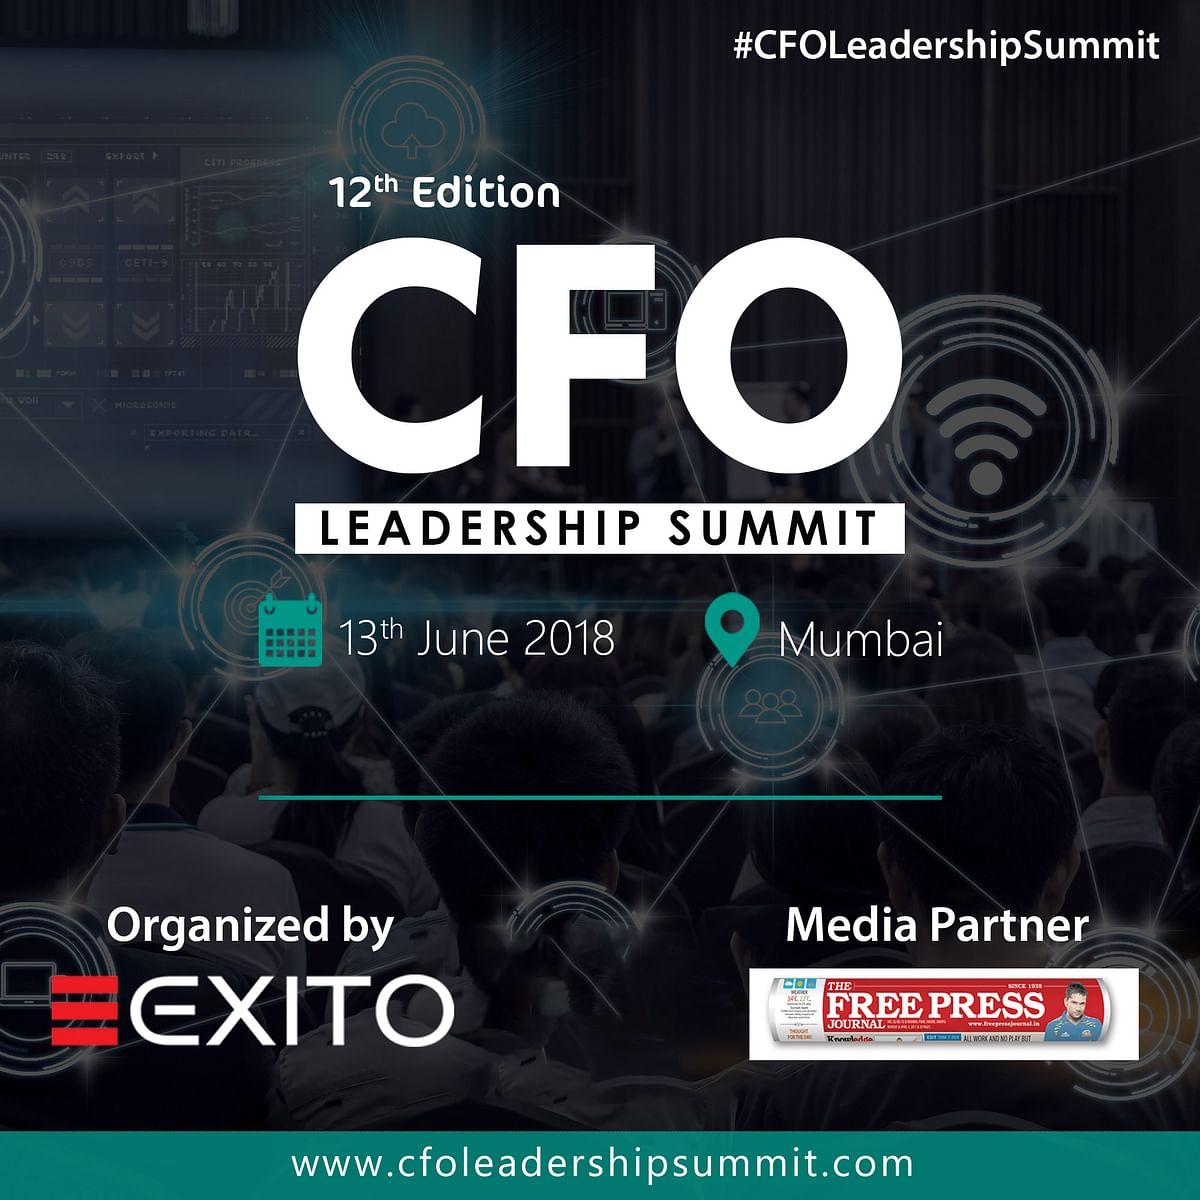 12th Edition of CFO Leadership Summit